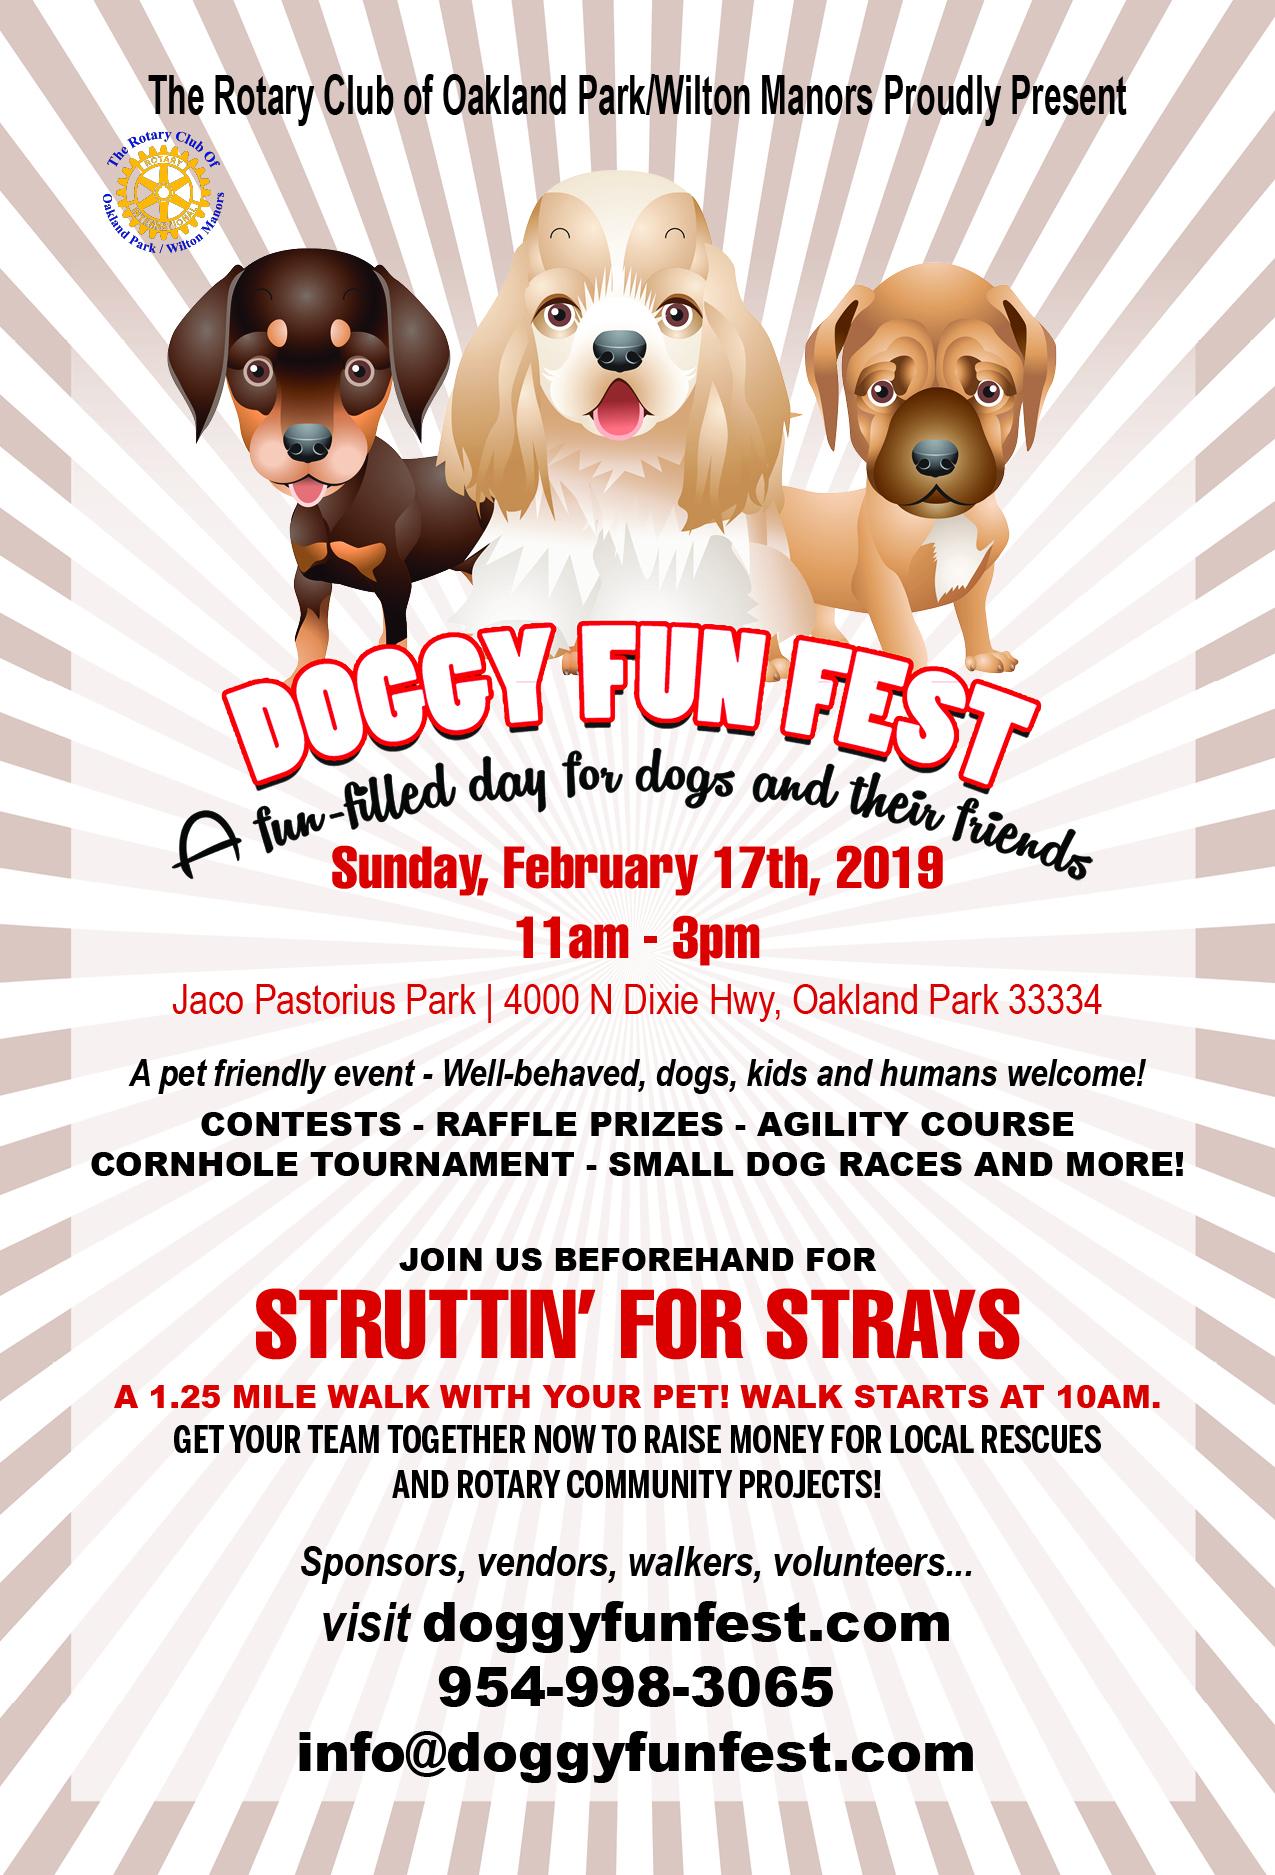 DOGGY FUN FEST 2/17/19 @ JACO PASTORIUS PARK | Oakland Park | Florida | United States